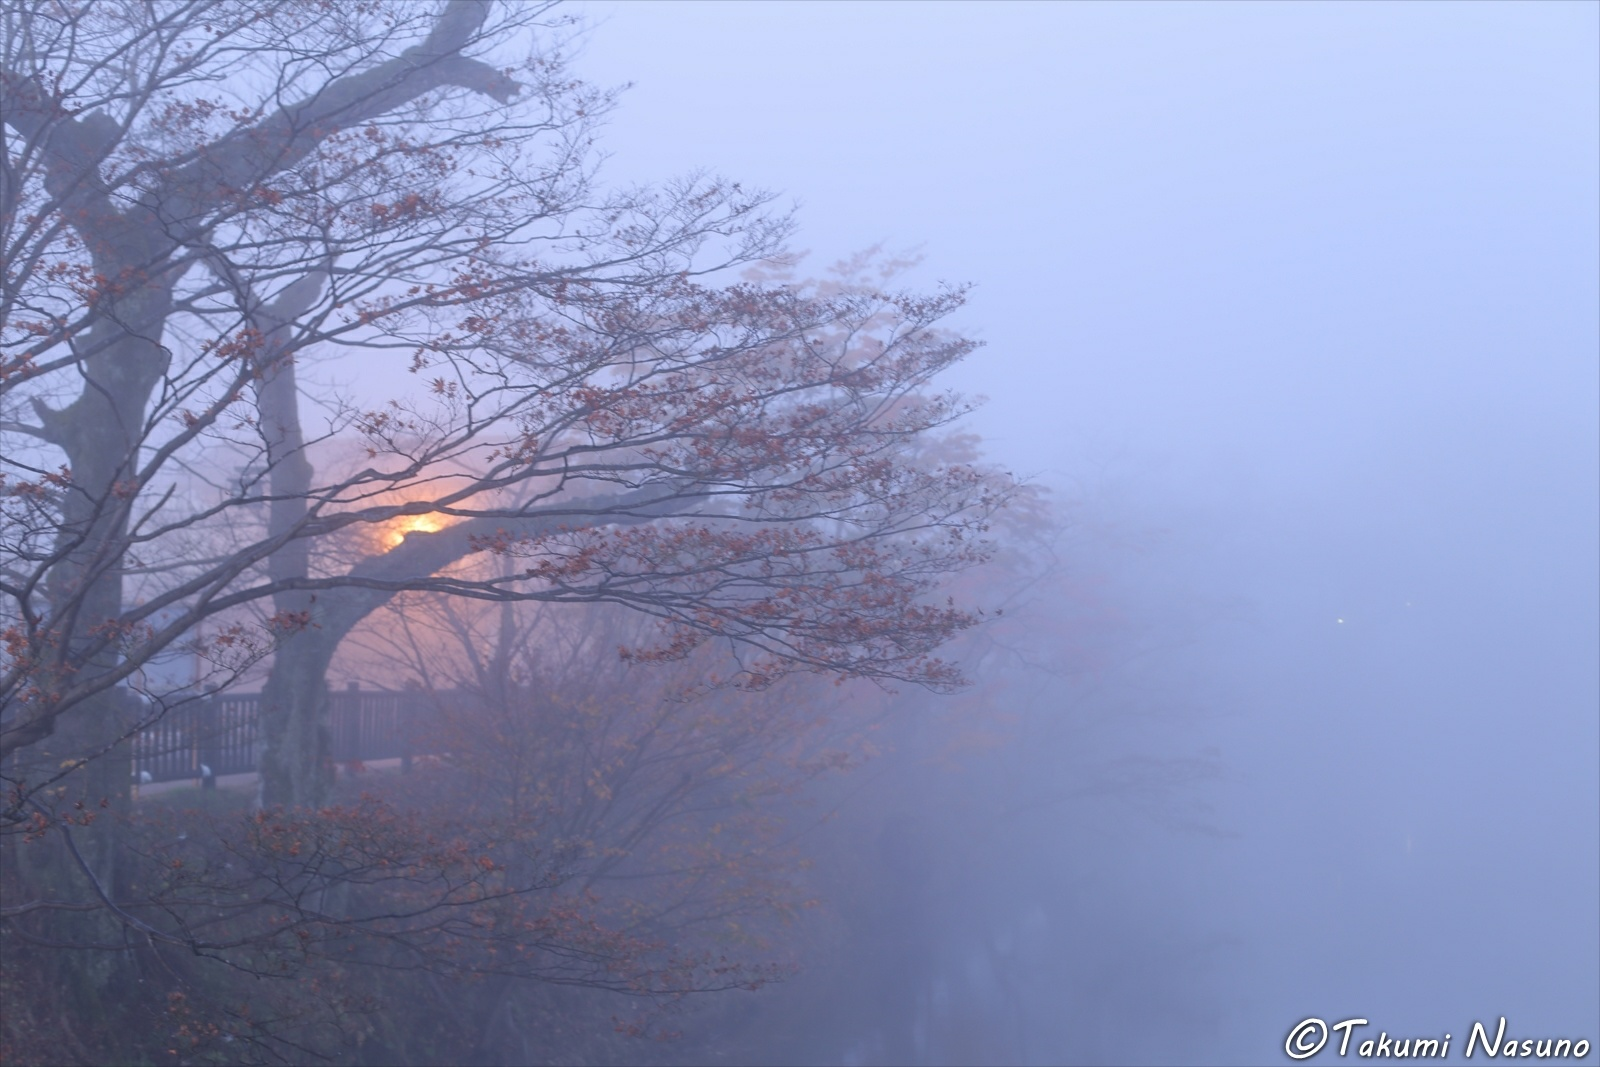 Light and Morning Mist of Tanagura Town